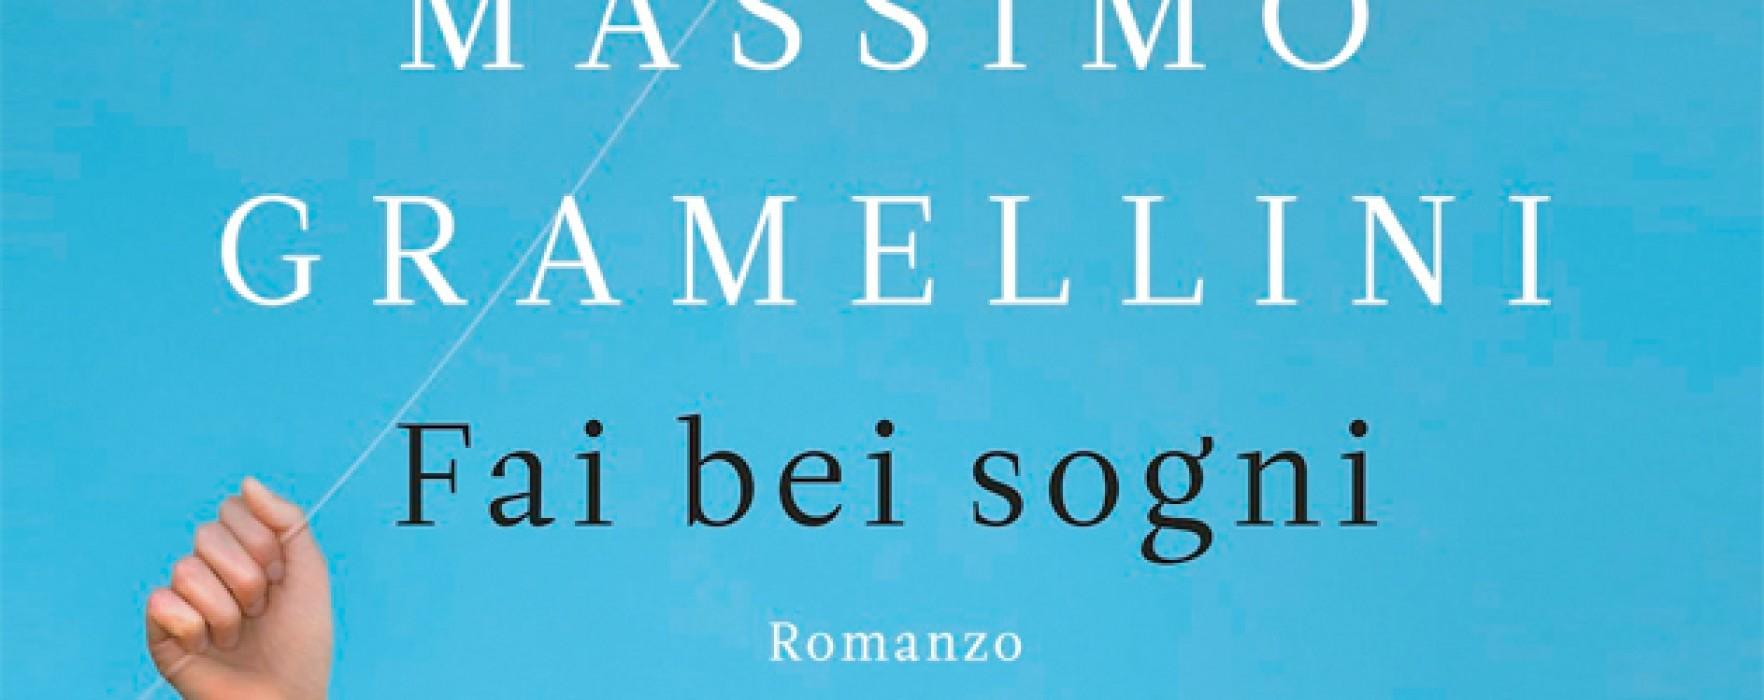 Fai bei sogni. Massimo Gramellini